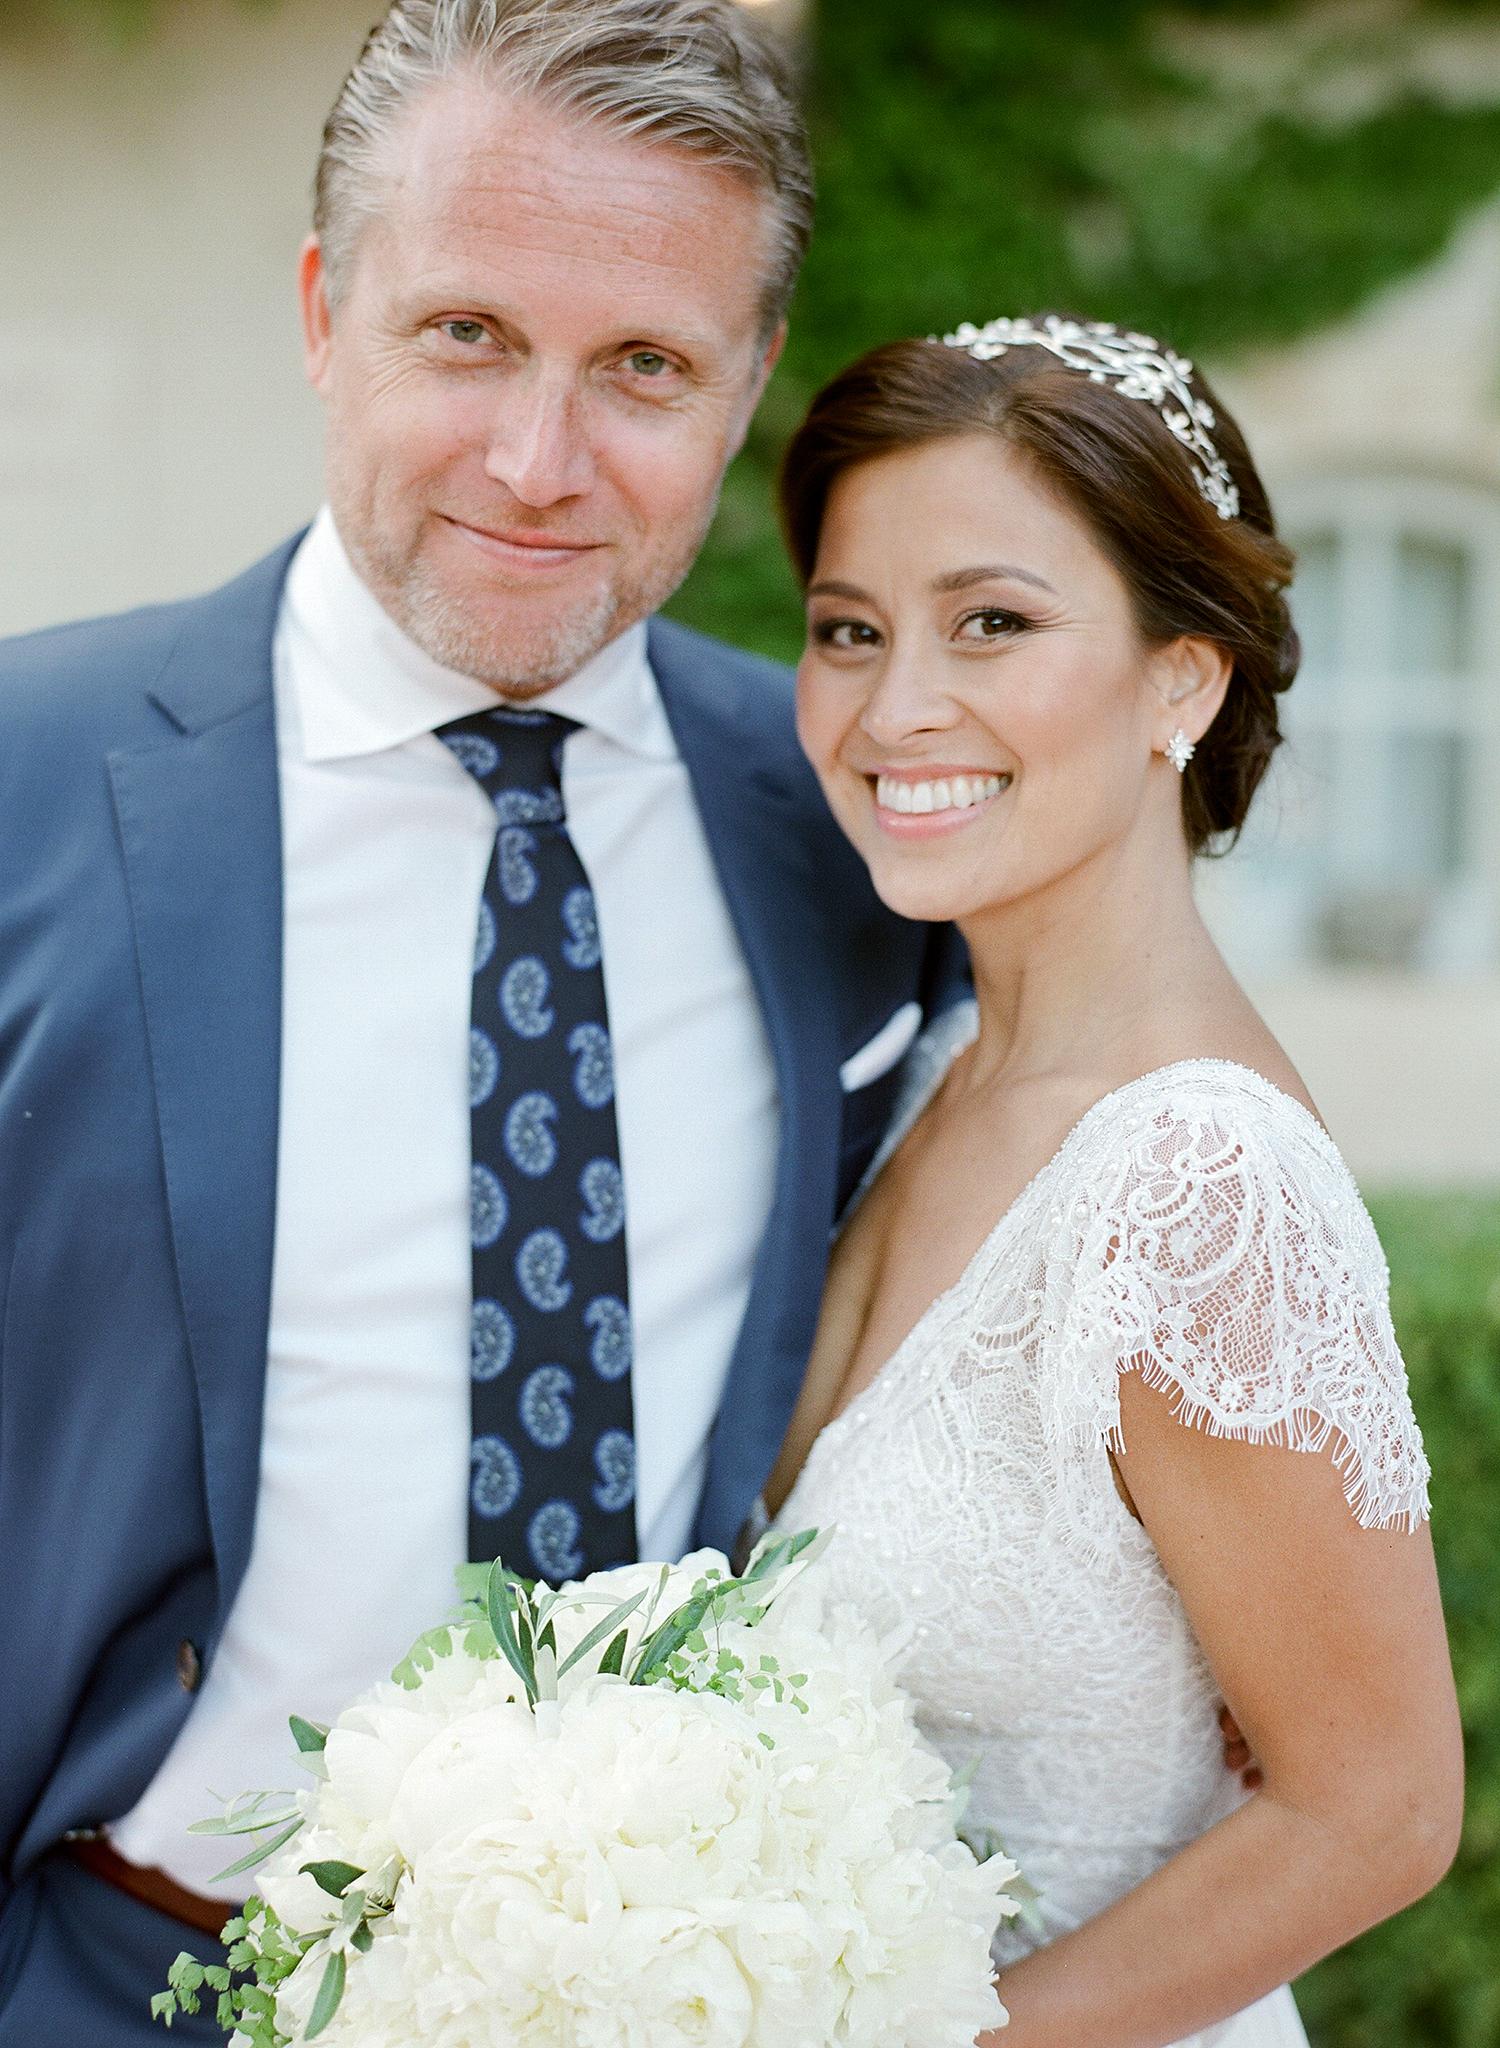 jannicke paal france wedding bride groom portrait